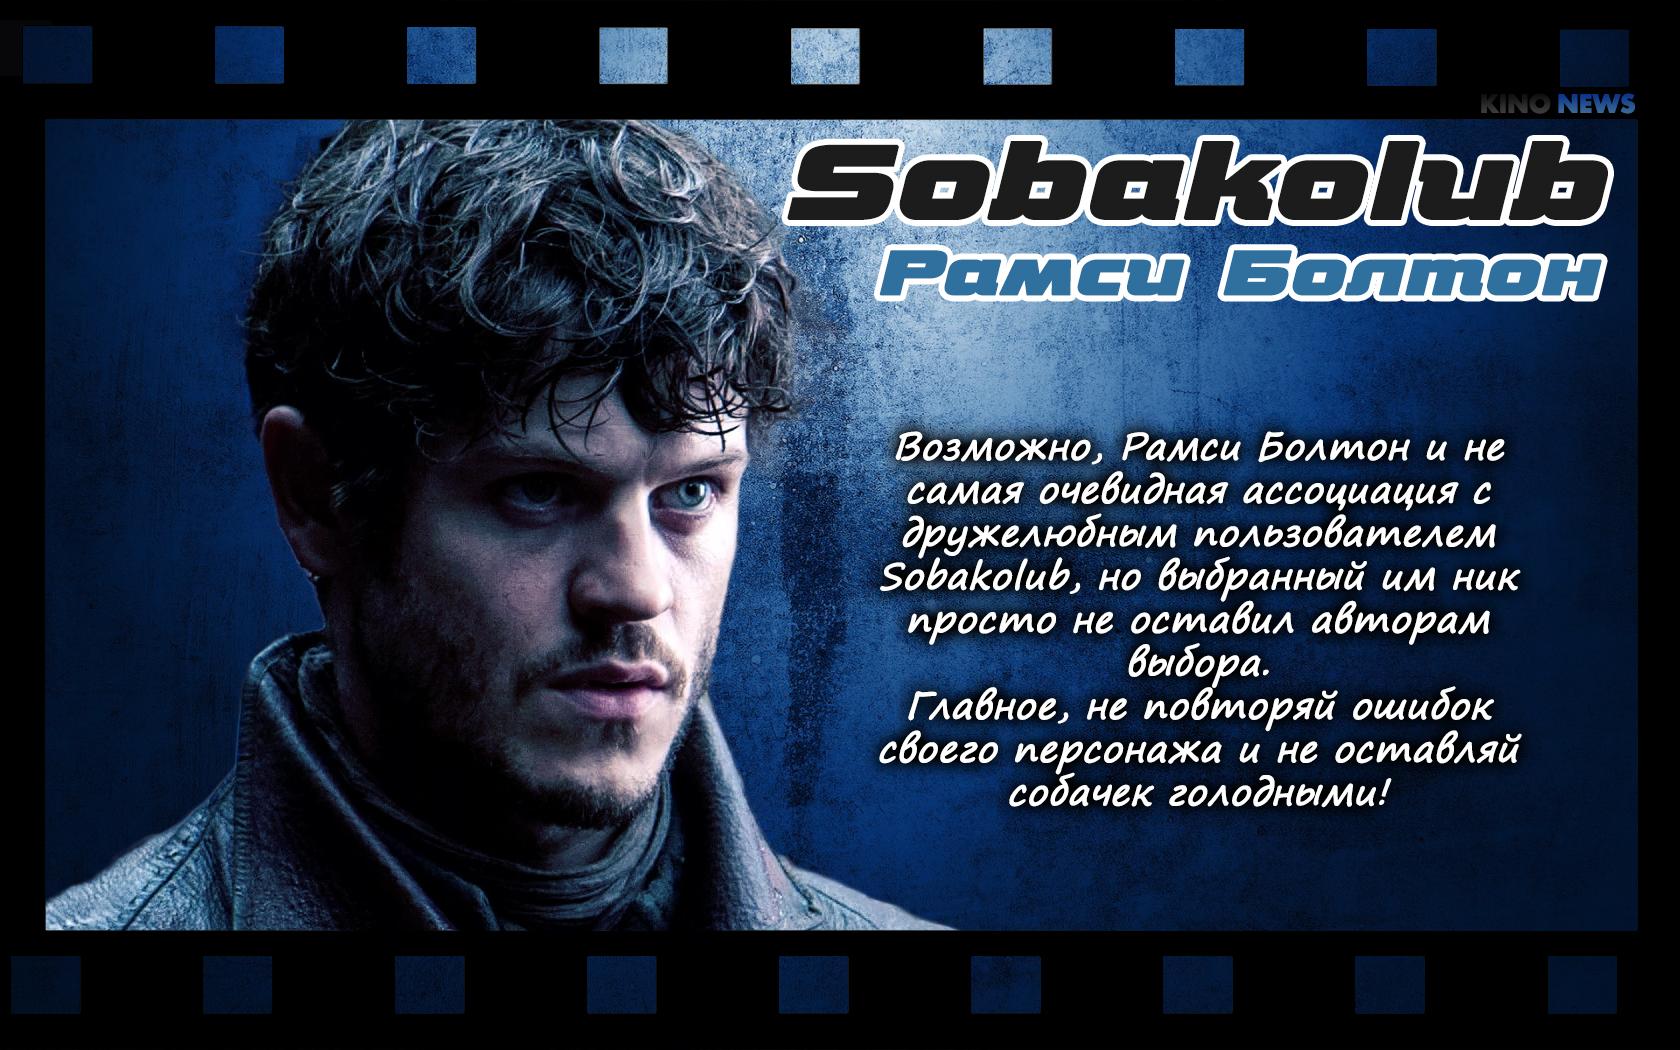 https://www.kinonews.ru/insimgs/2017/persimg/persimg77944_58.jpg